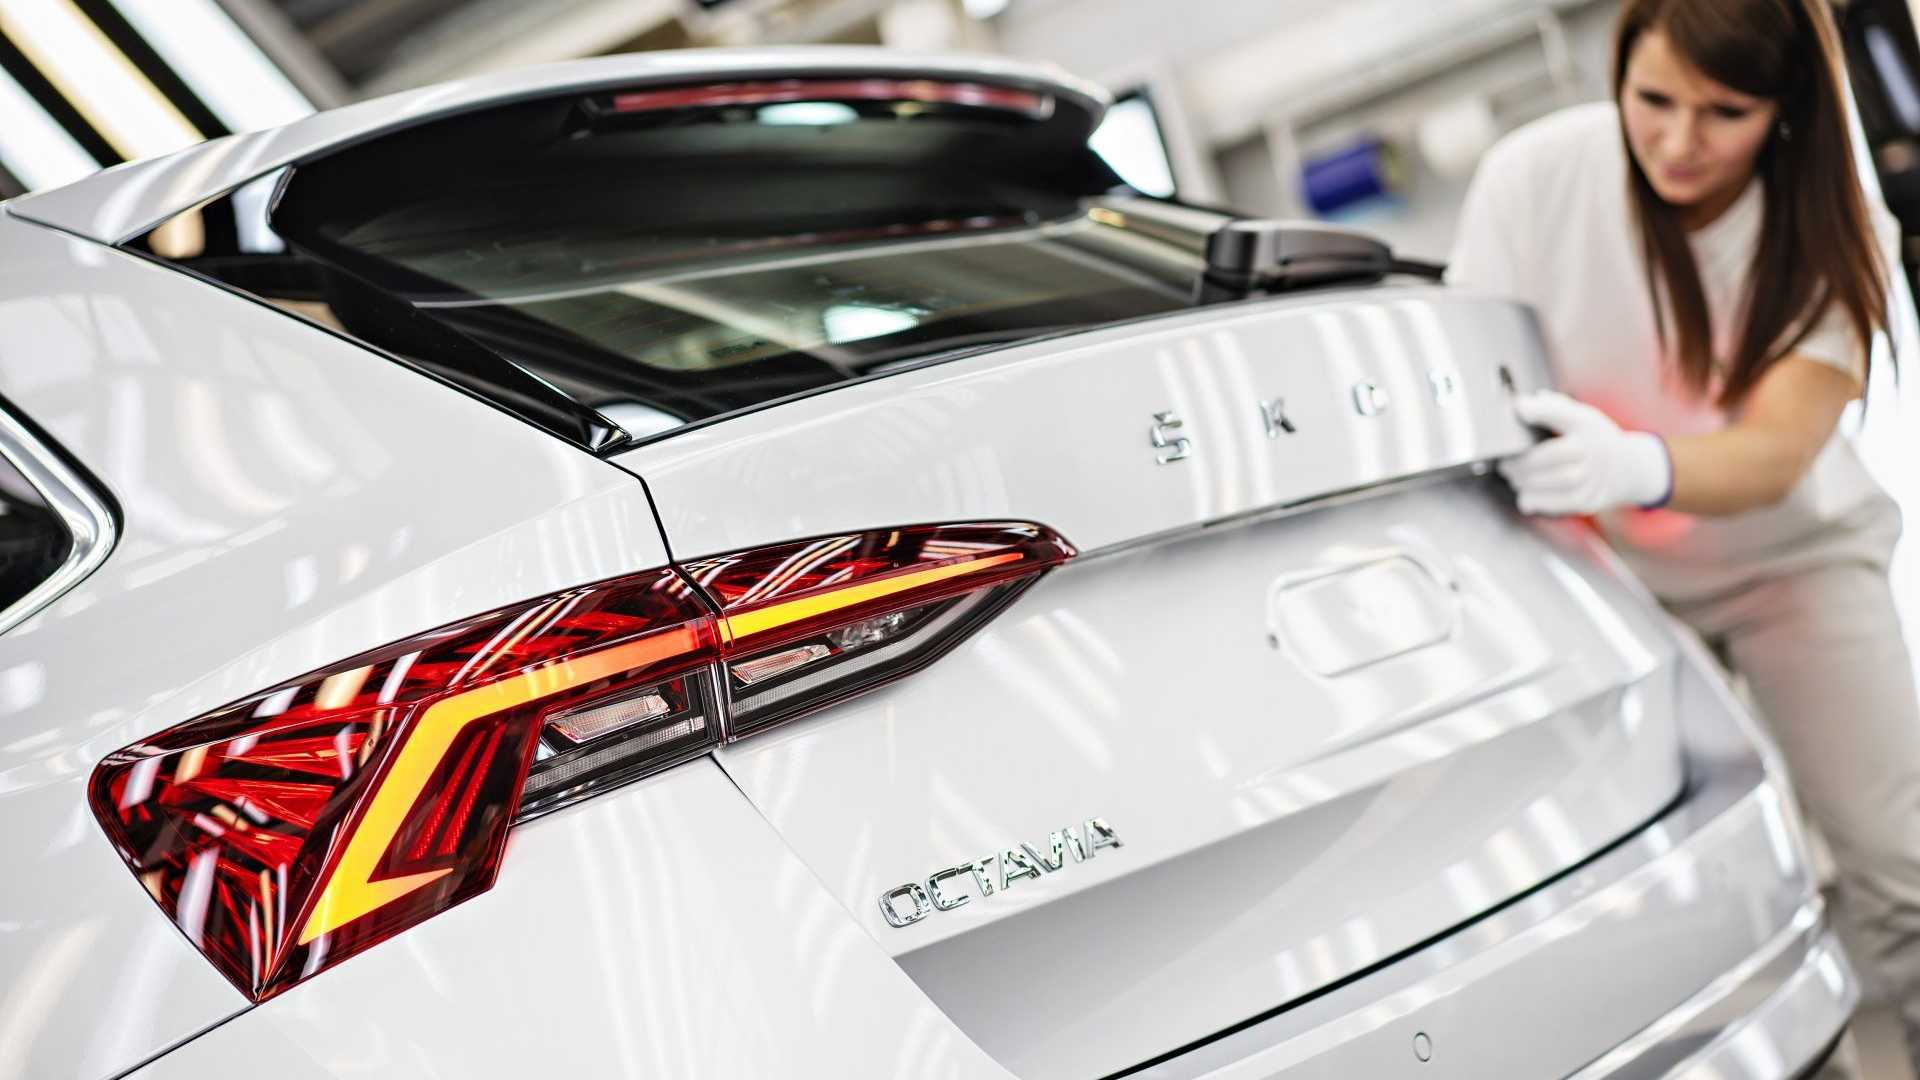 2020 Skoda Octavia Production Begins Wagon Prioritized